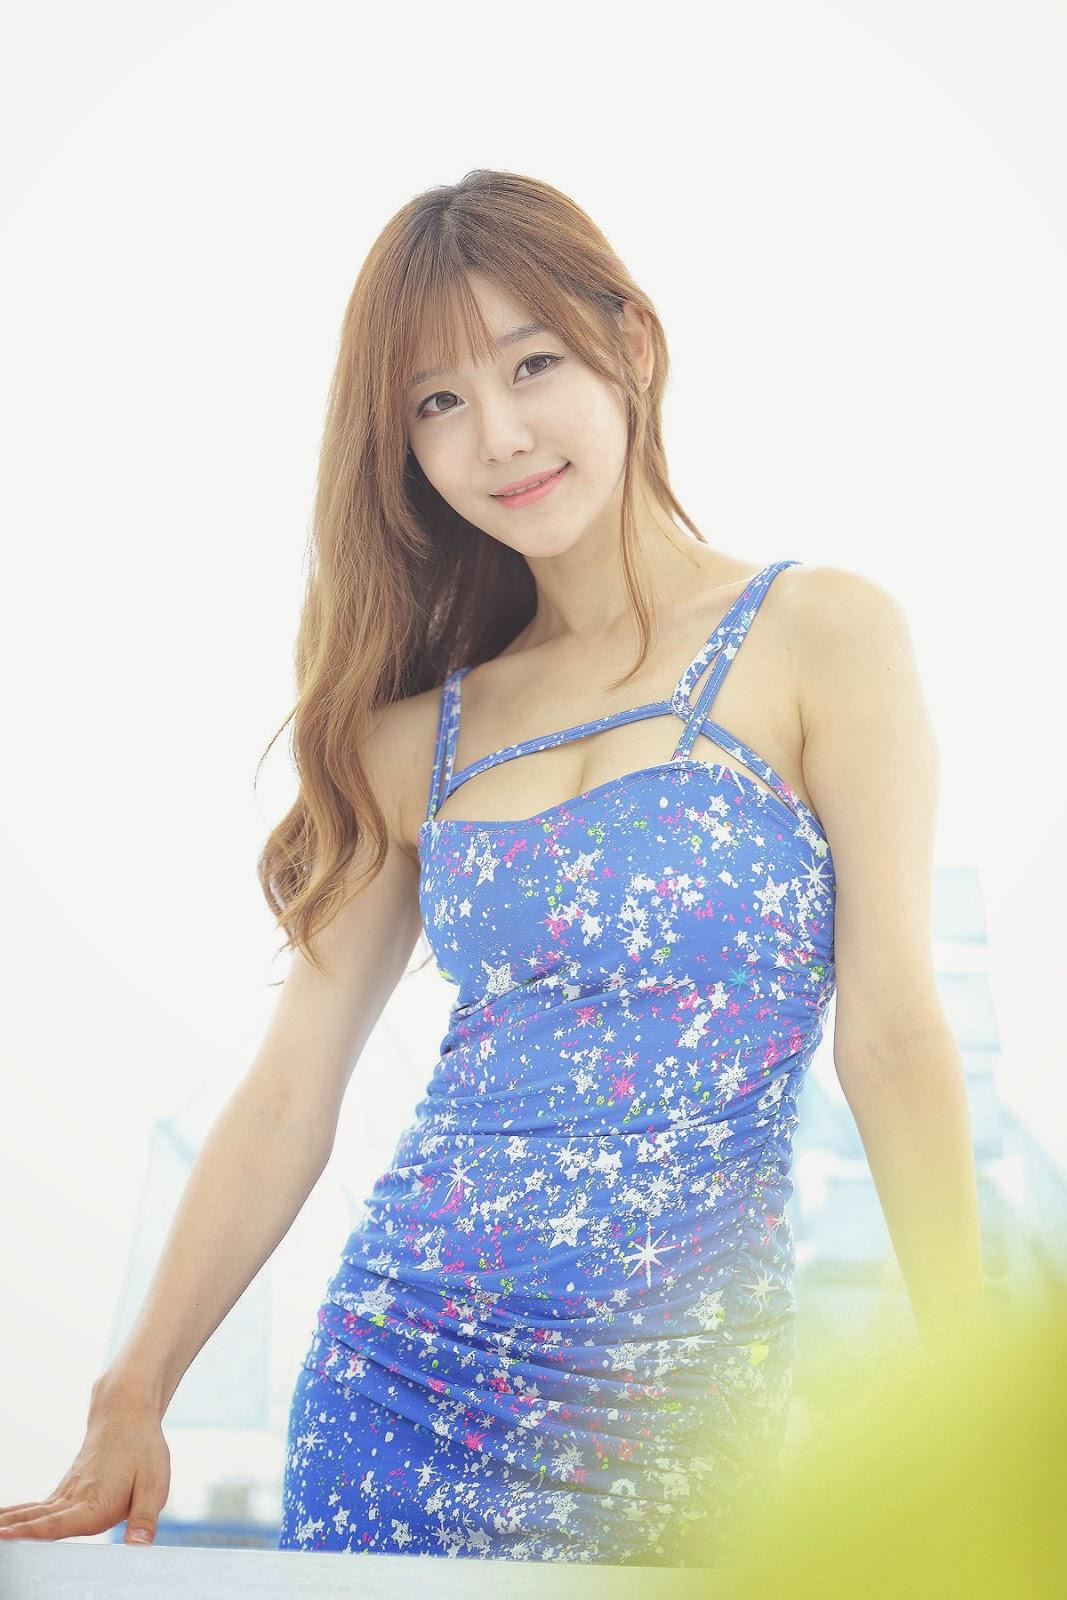 Choi Seul Ki - Lovely Seul Ki In Blue Dress-5225